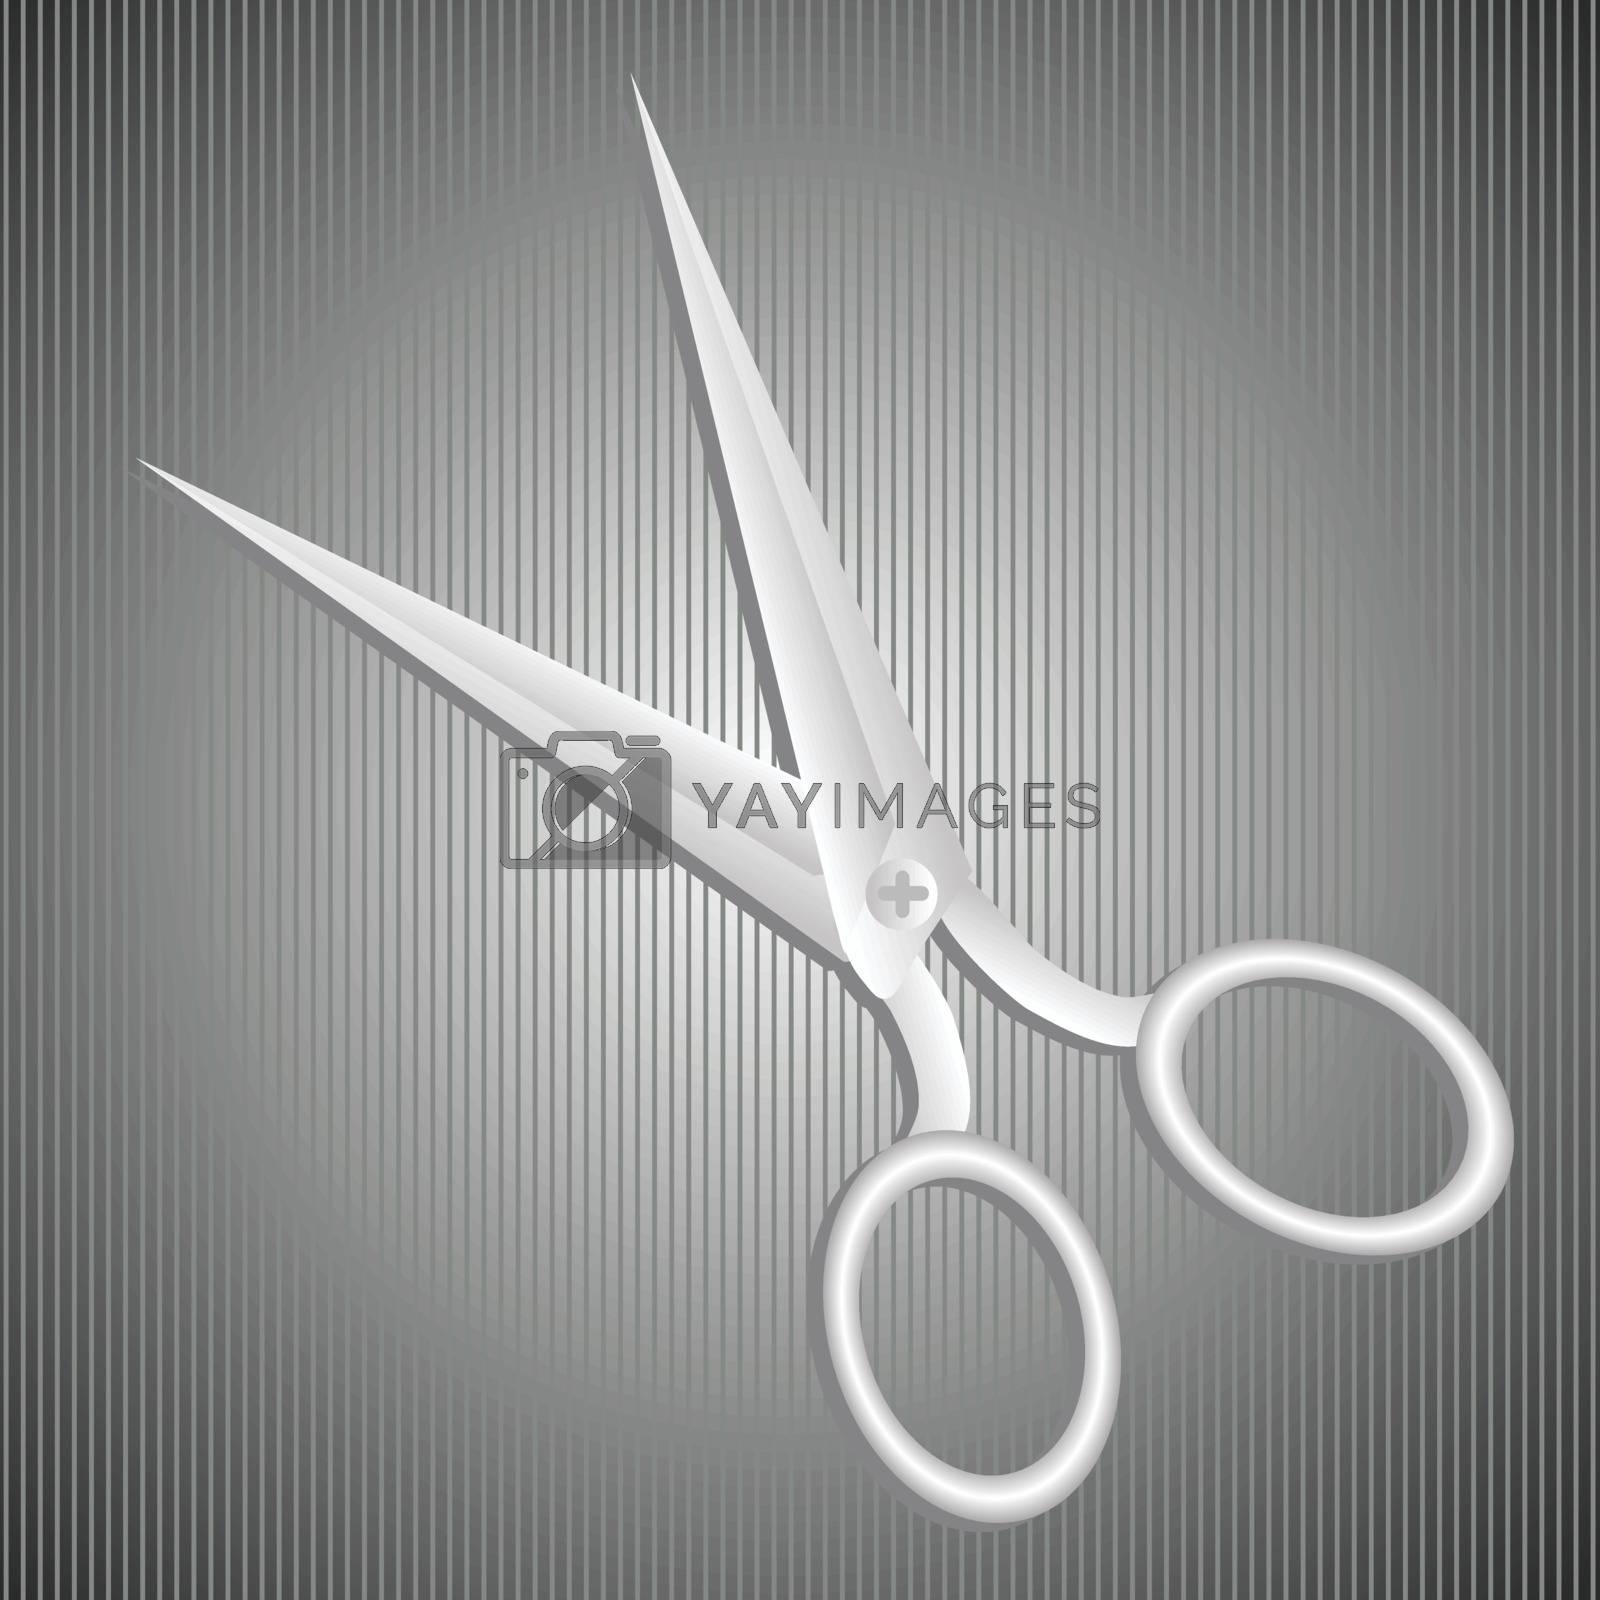 Royalty free image of metal scissors by valeo5